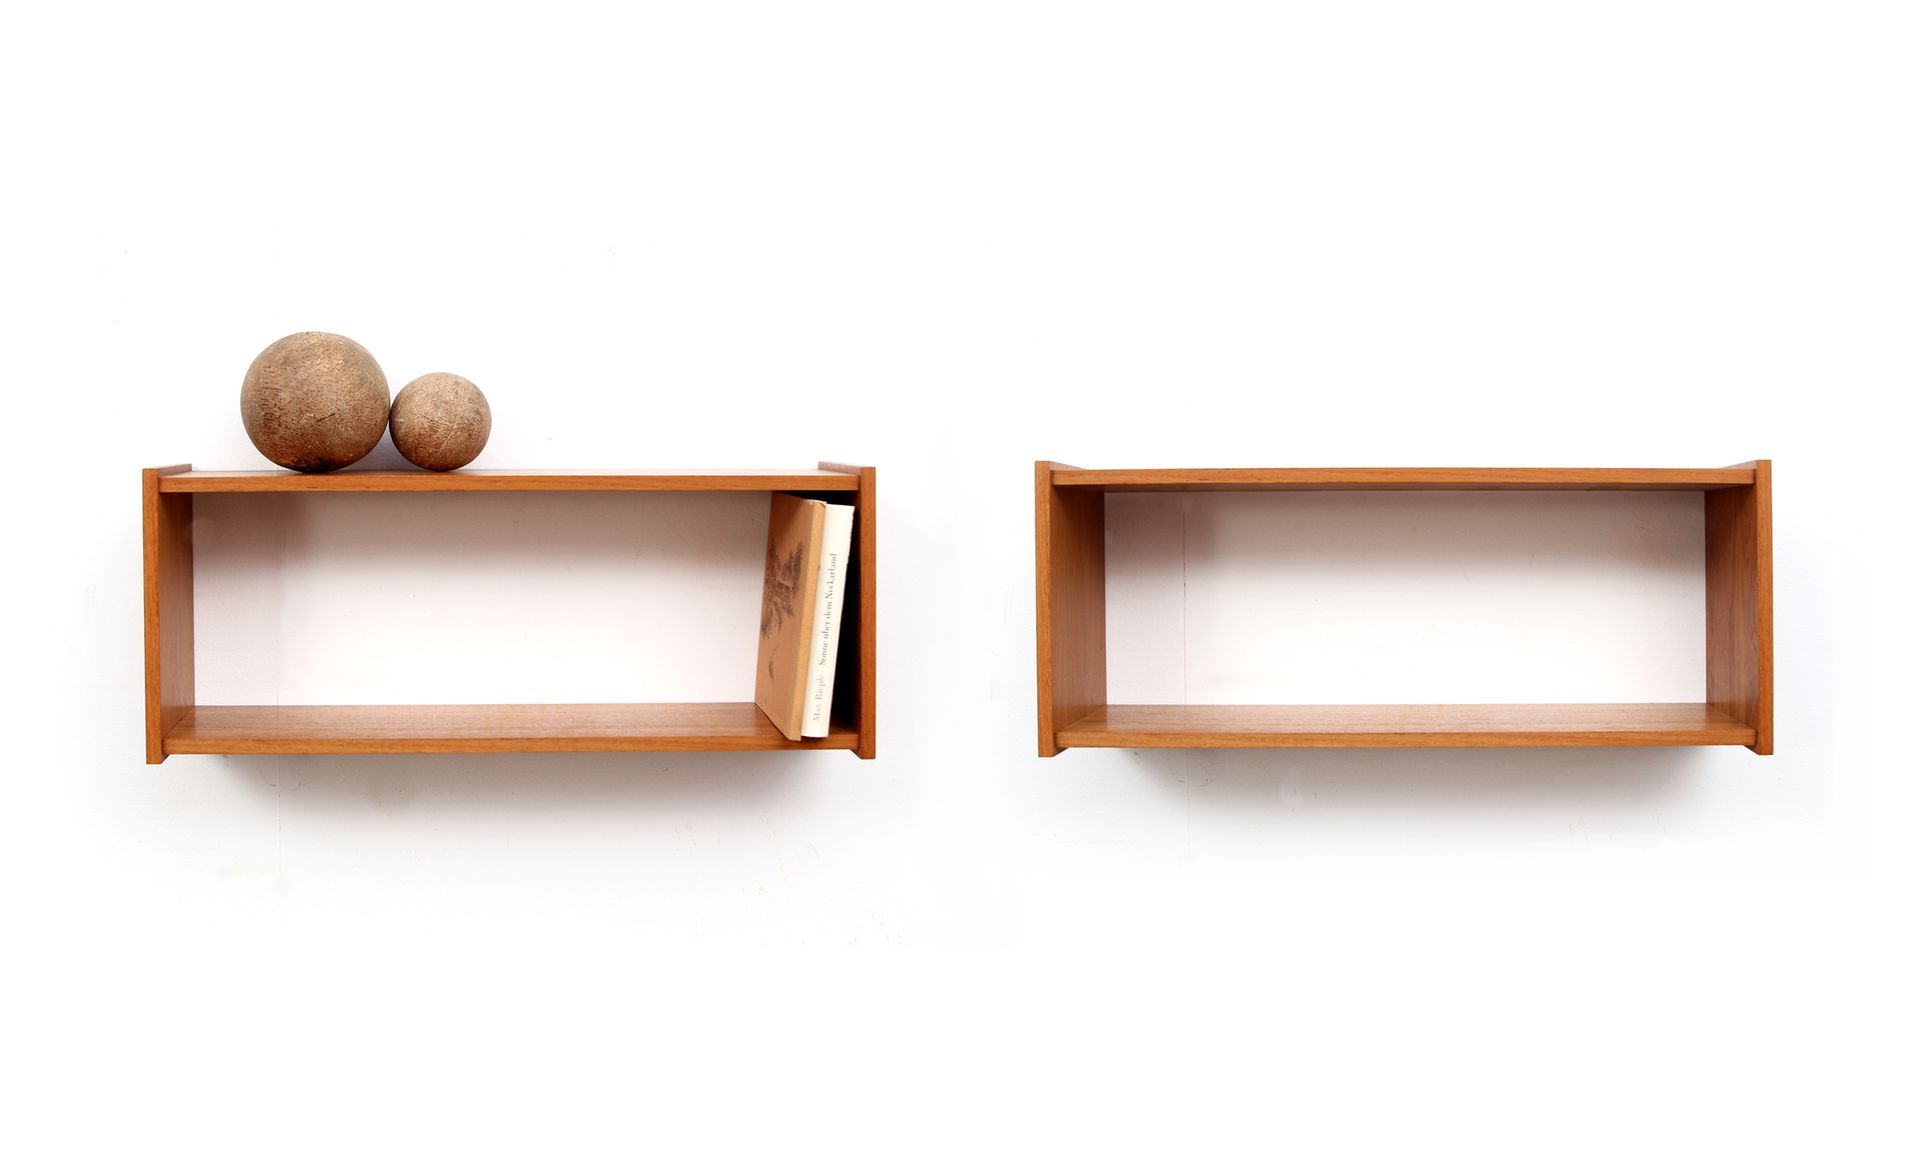 wall mounted teak shelves 1960s set of 2 for sale at pamono. Black Bedroom Furniture Sets. Home Design Ideas